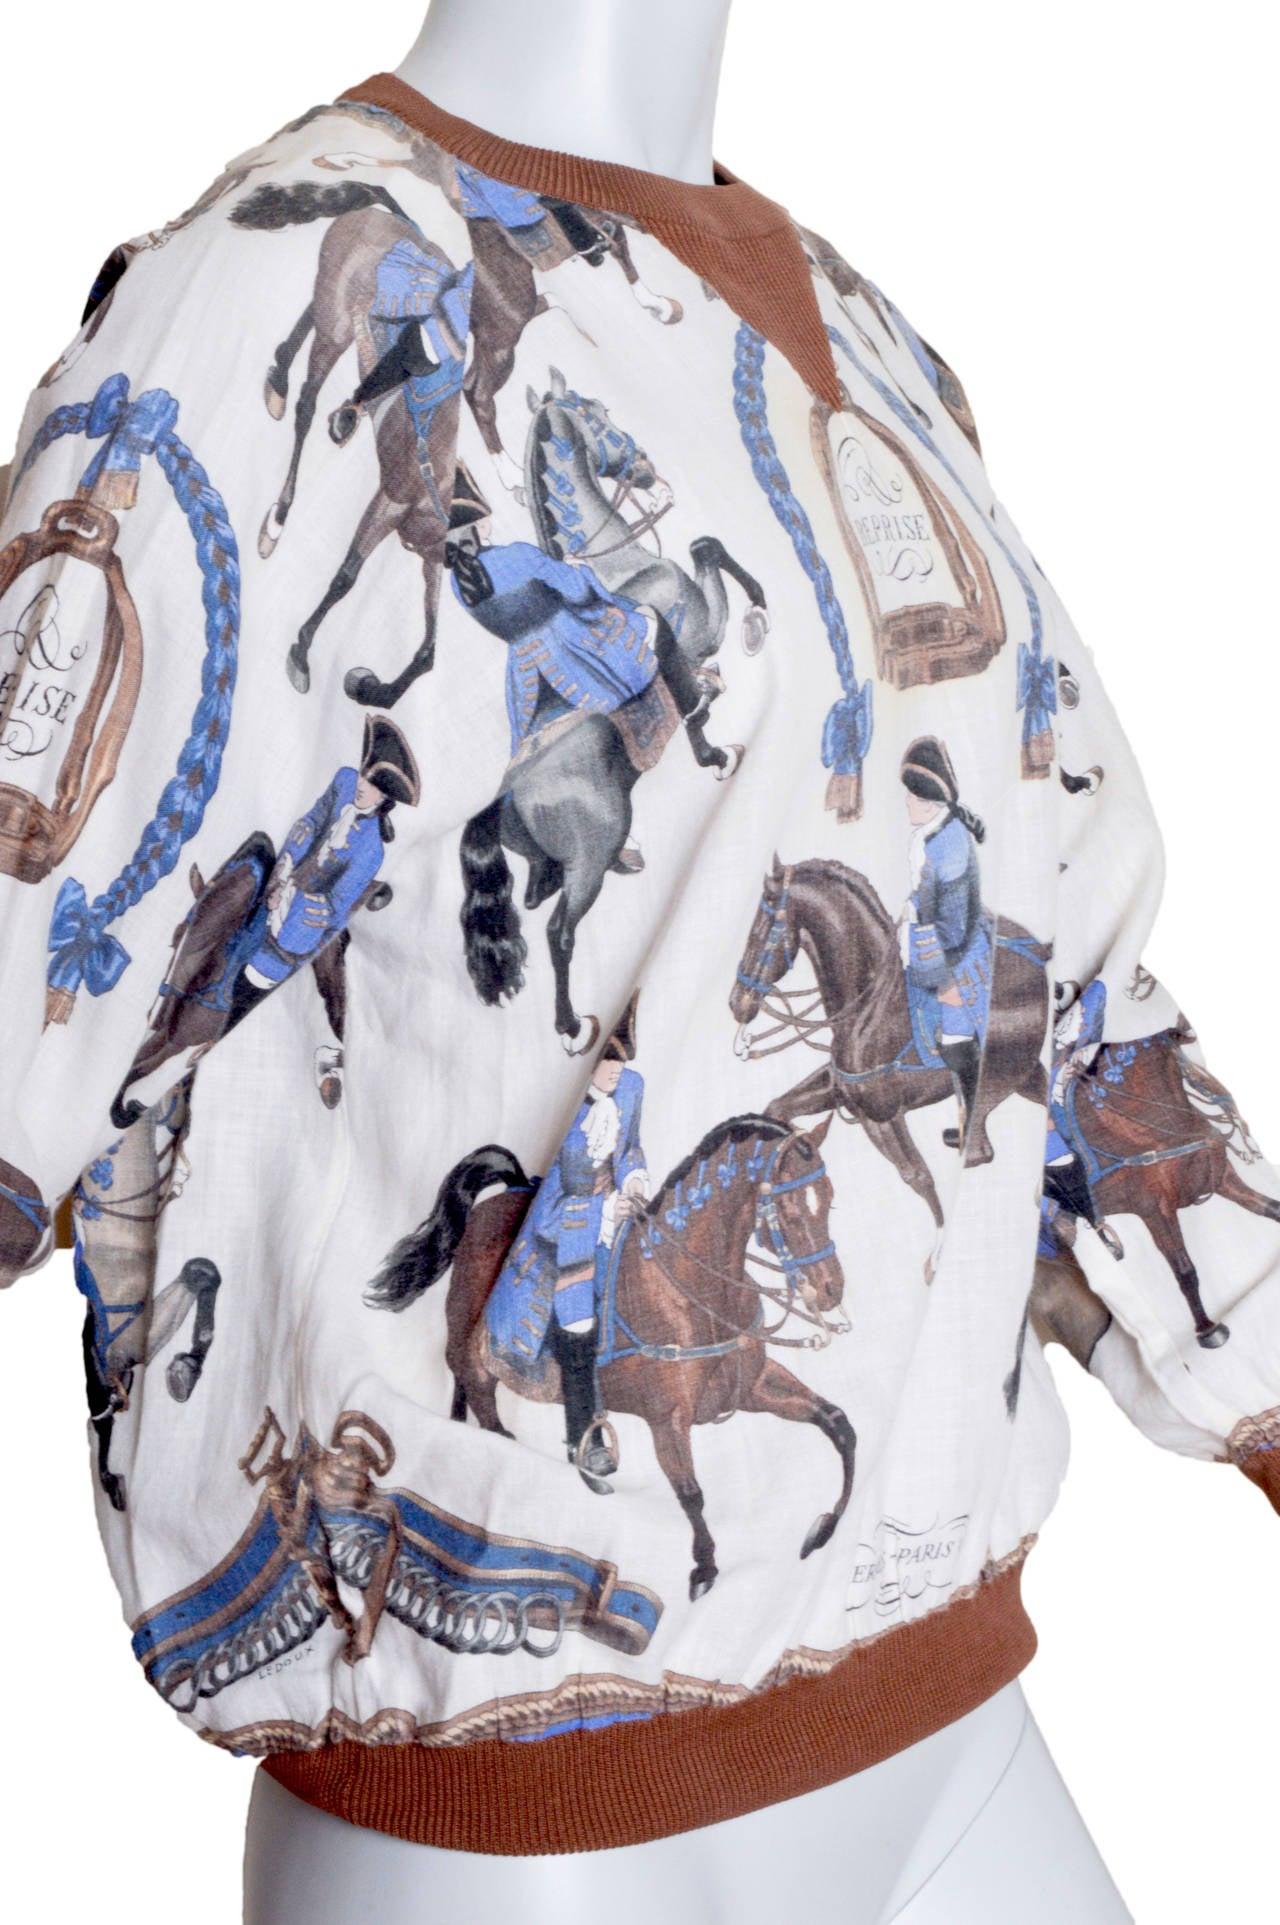 Hermes Equestrian Scarf Print Blouse 3